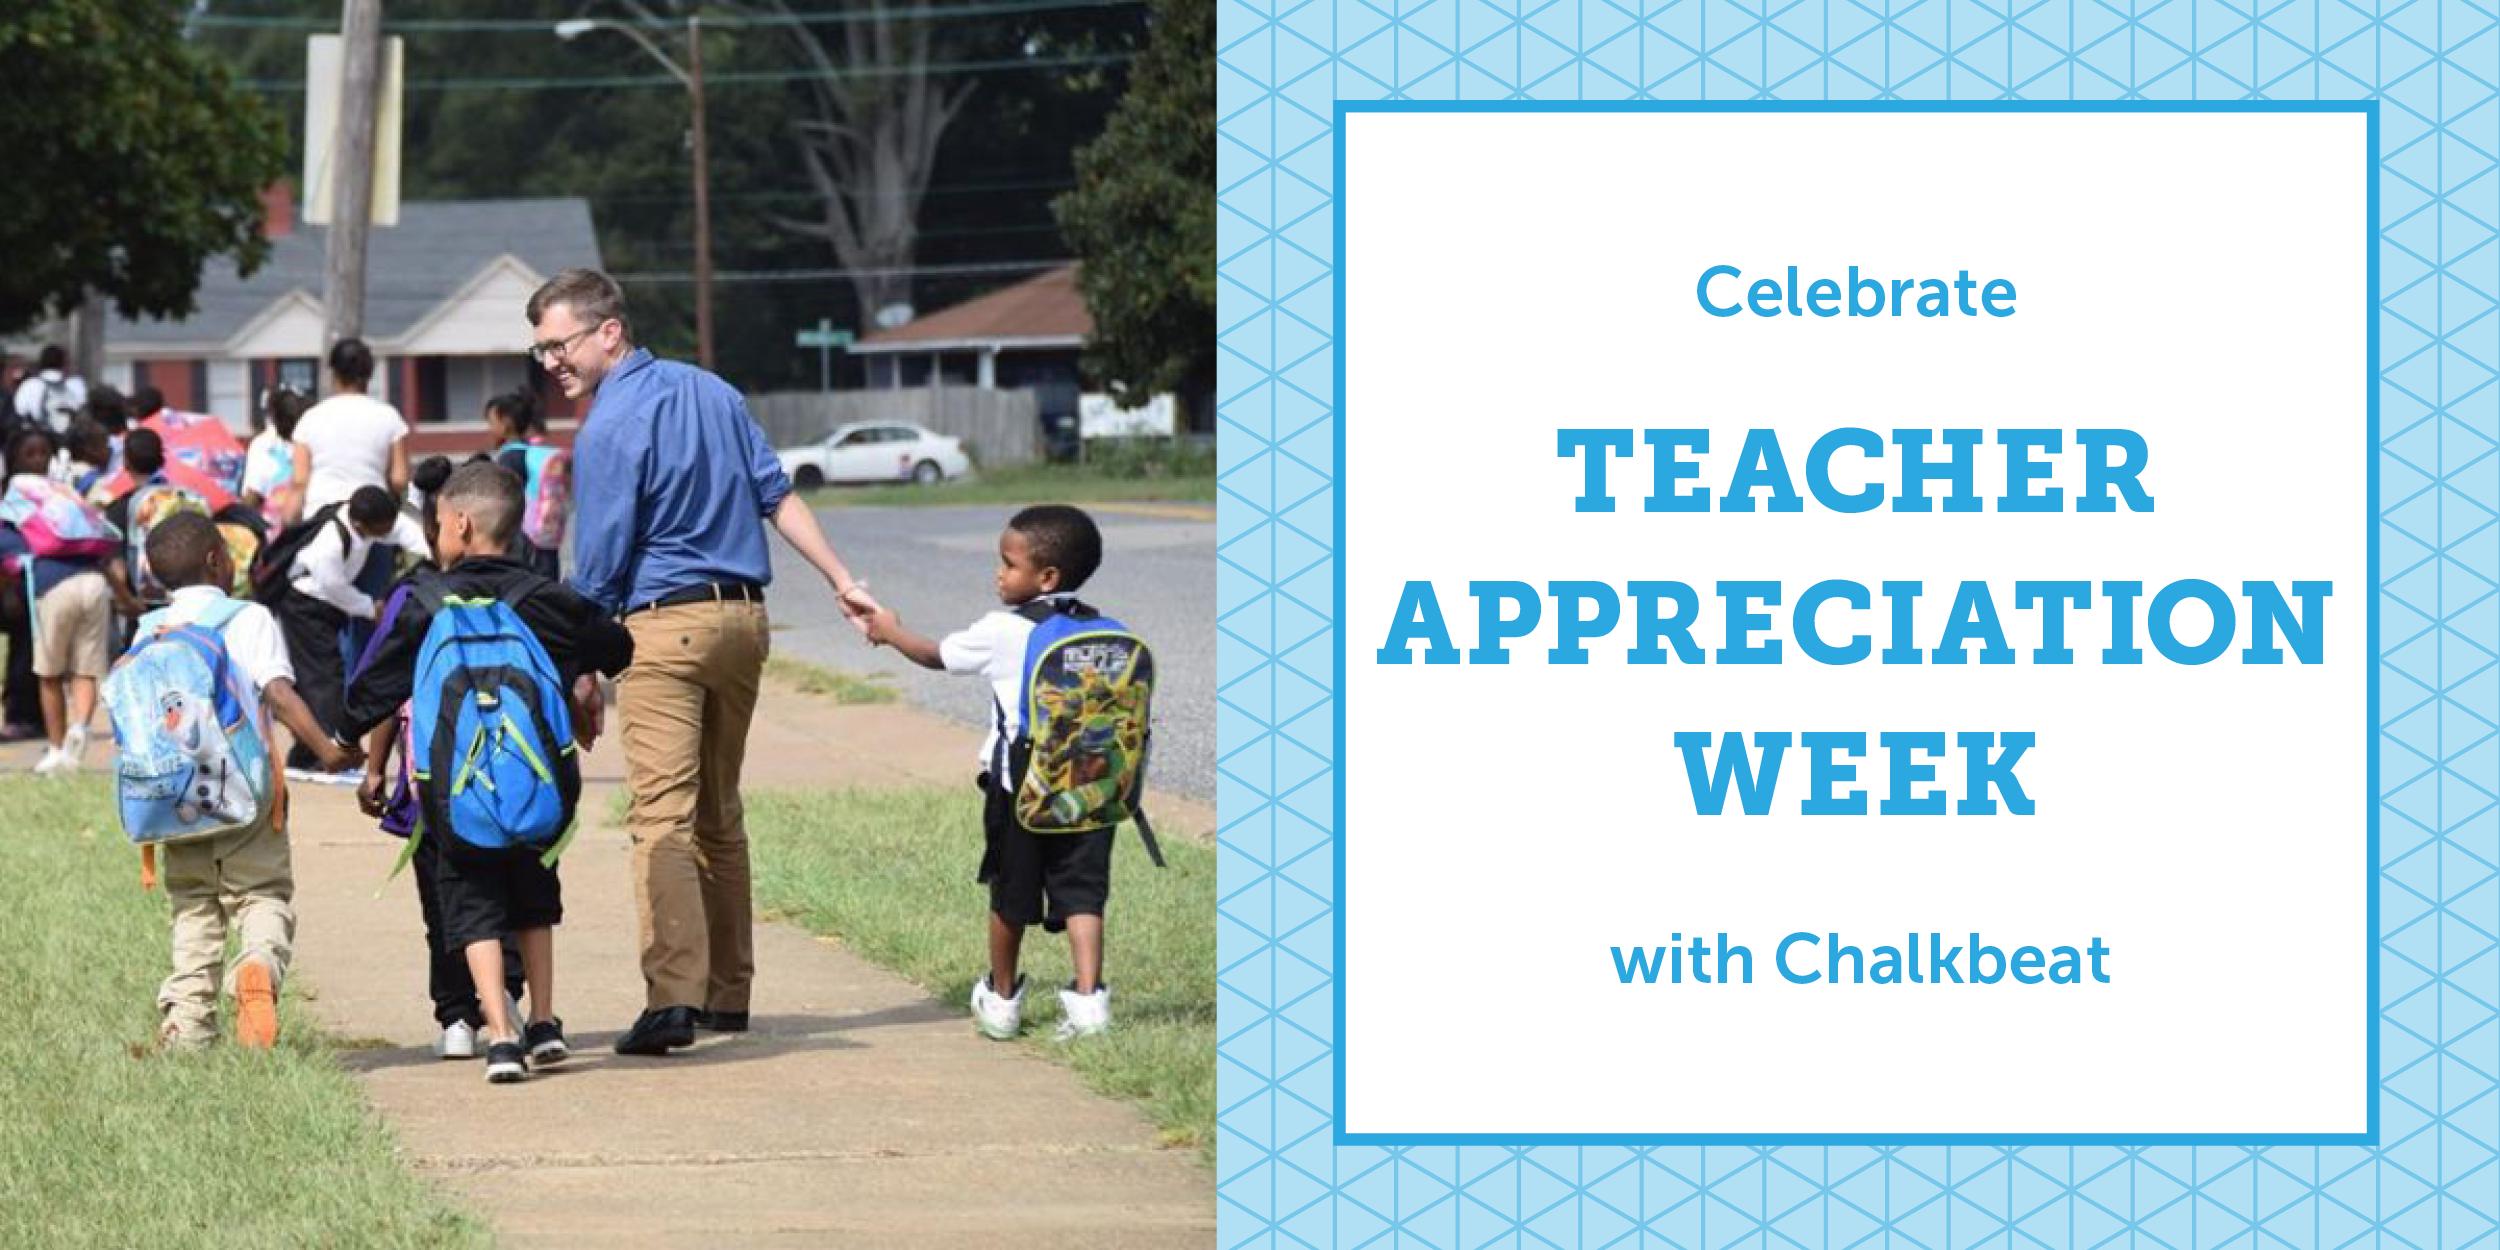 Chris Hill, a Memphis teacher, walks his students home after school. (Photo courtesy Chris Hill)